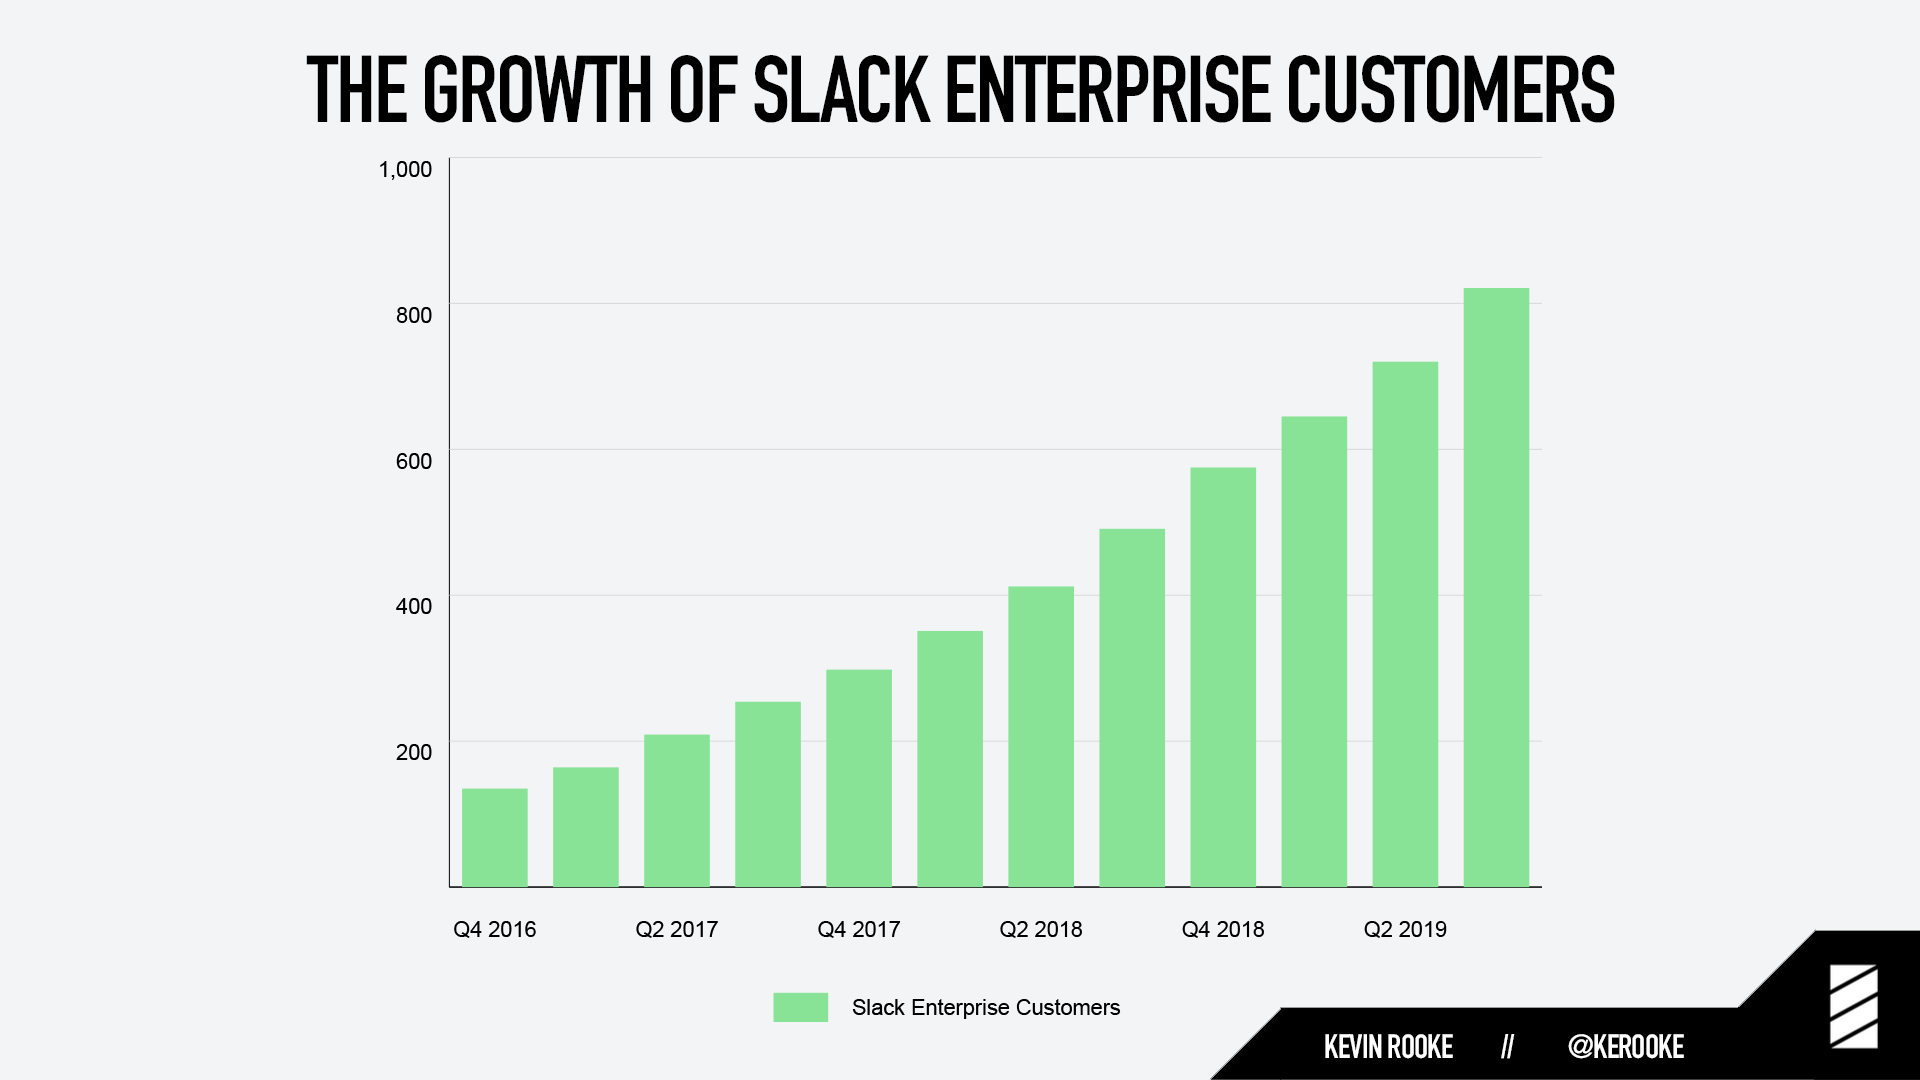 The growth of slack enterprise customers.